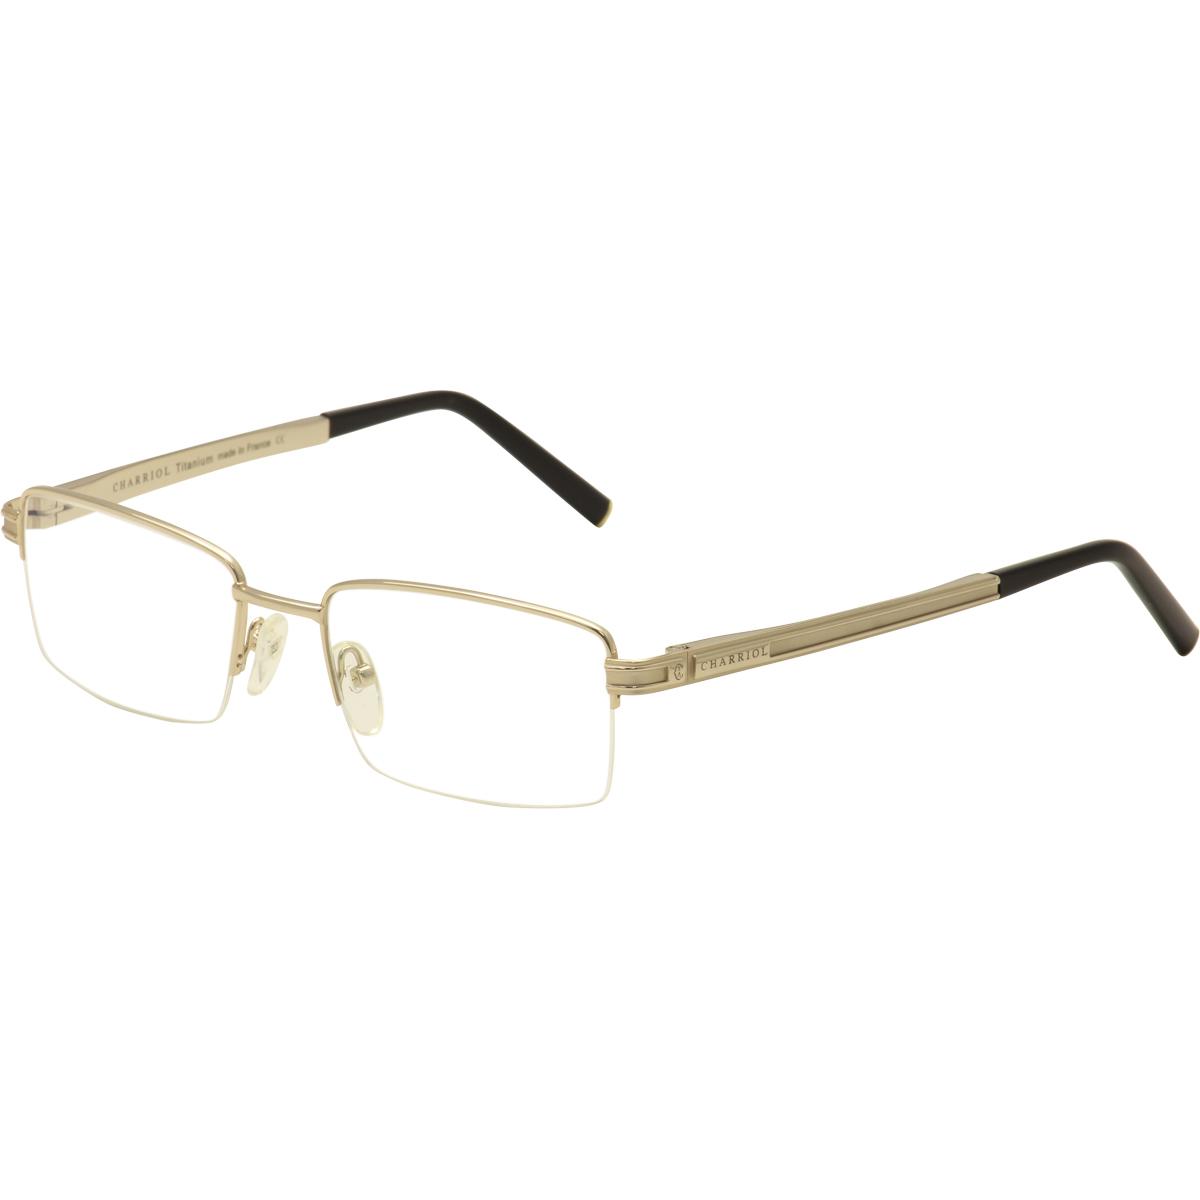 Gold Plated Glasses Frames : Charriol Mens Eyeglasses PC/7475 C7 22K Gold Plated ...